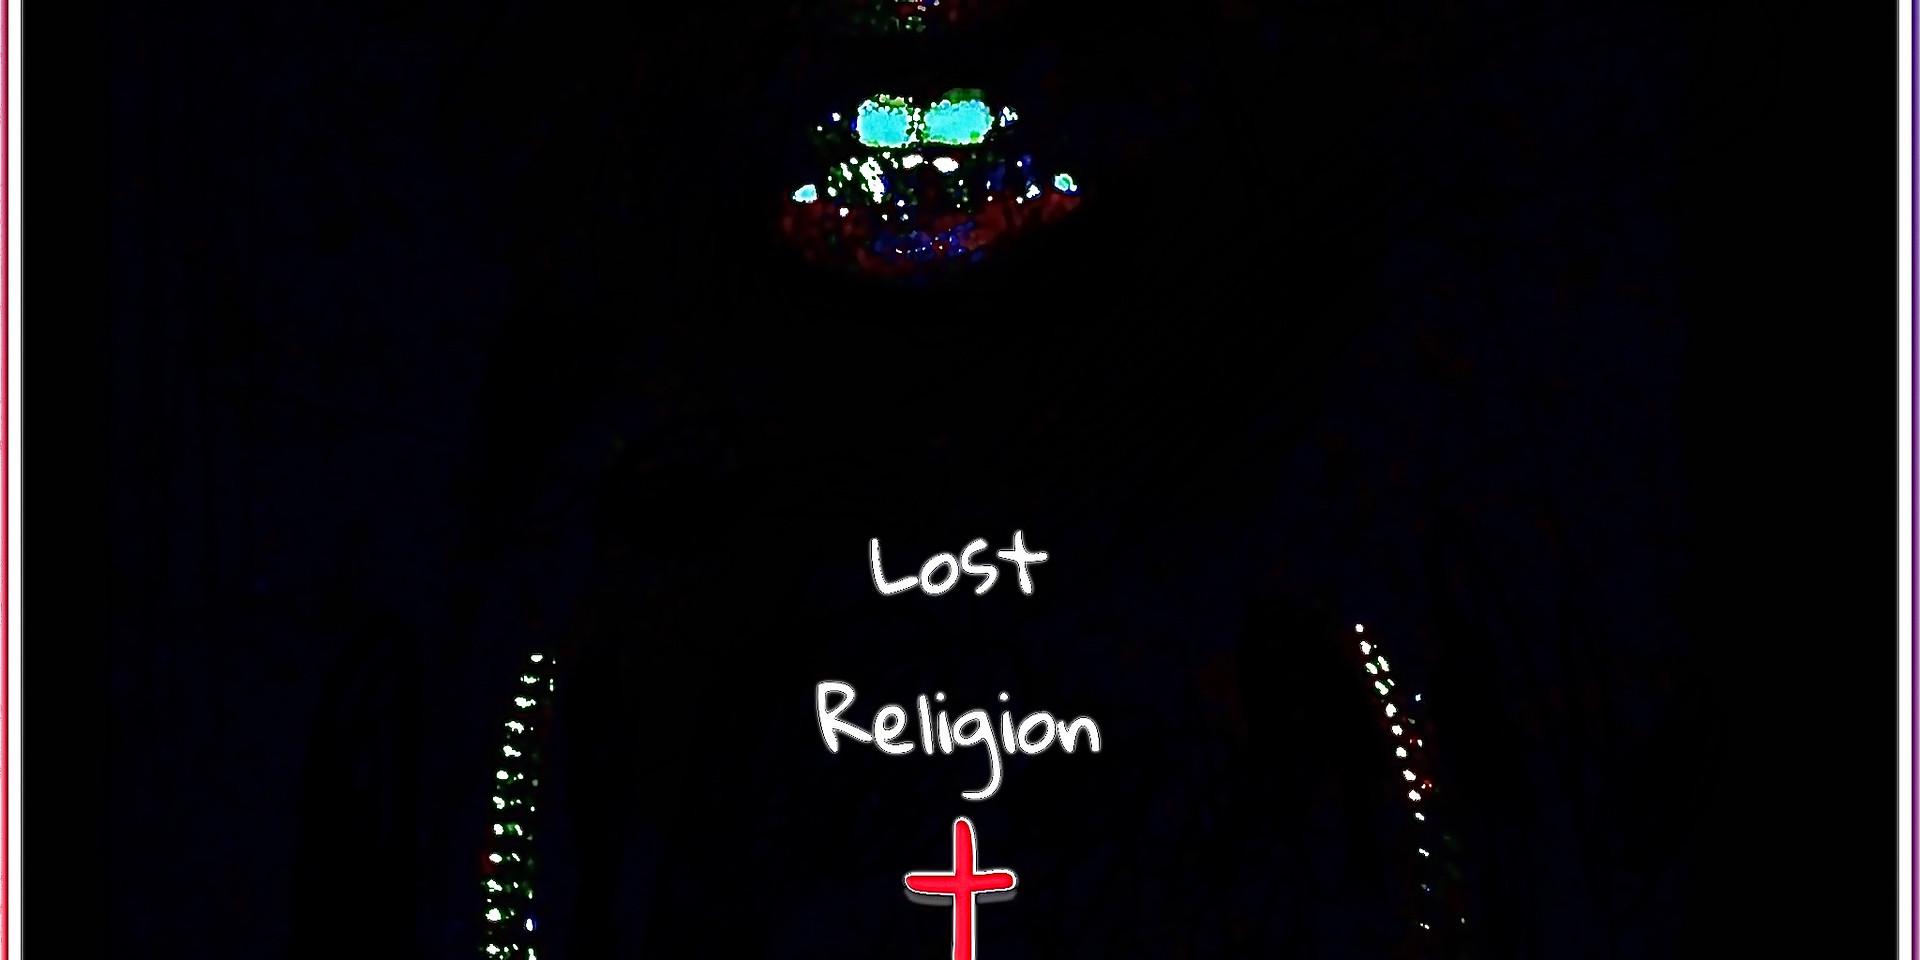 ALPHA23 LOST RELIGION/FULL UNLAWFUL CARNAL KNOWLEDGE